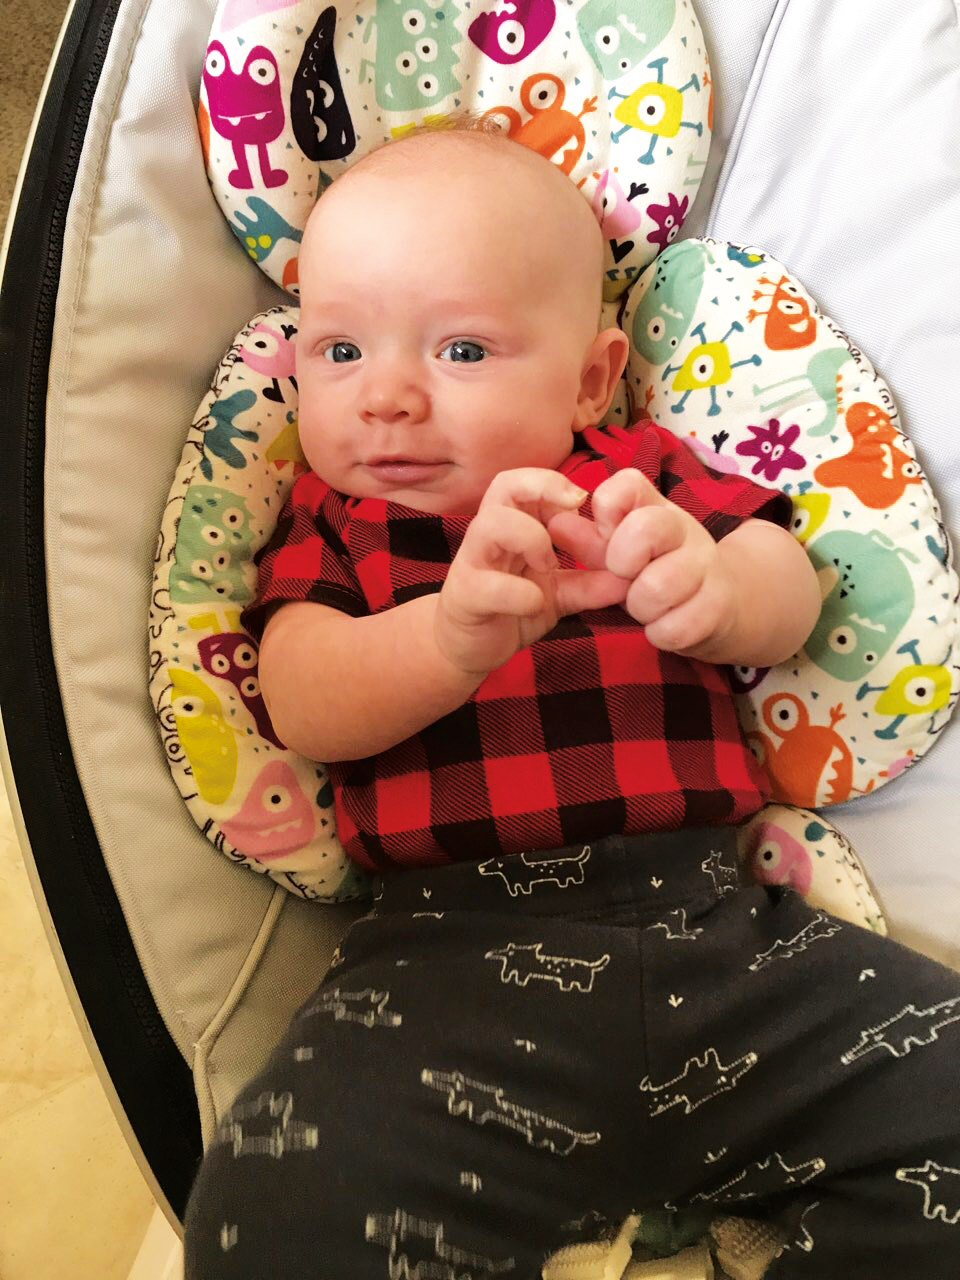 Raphael, son of Aidan Tait '04, was born in February 2019.